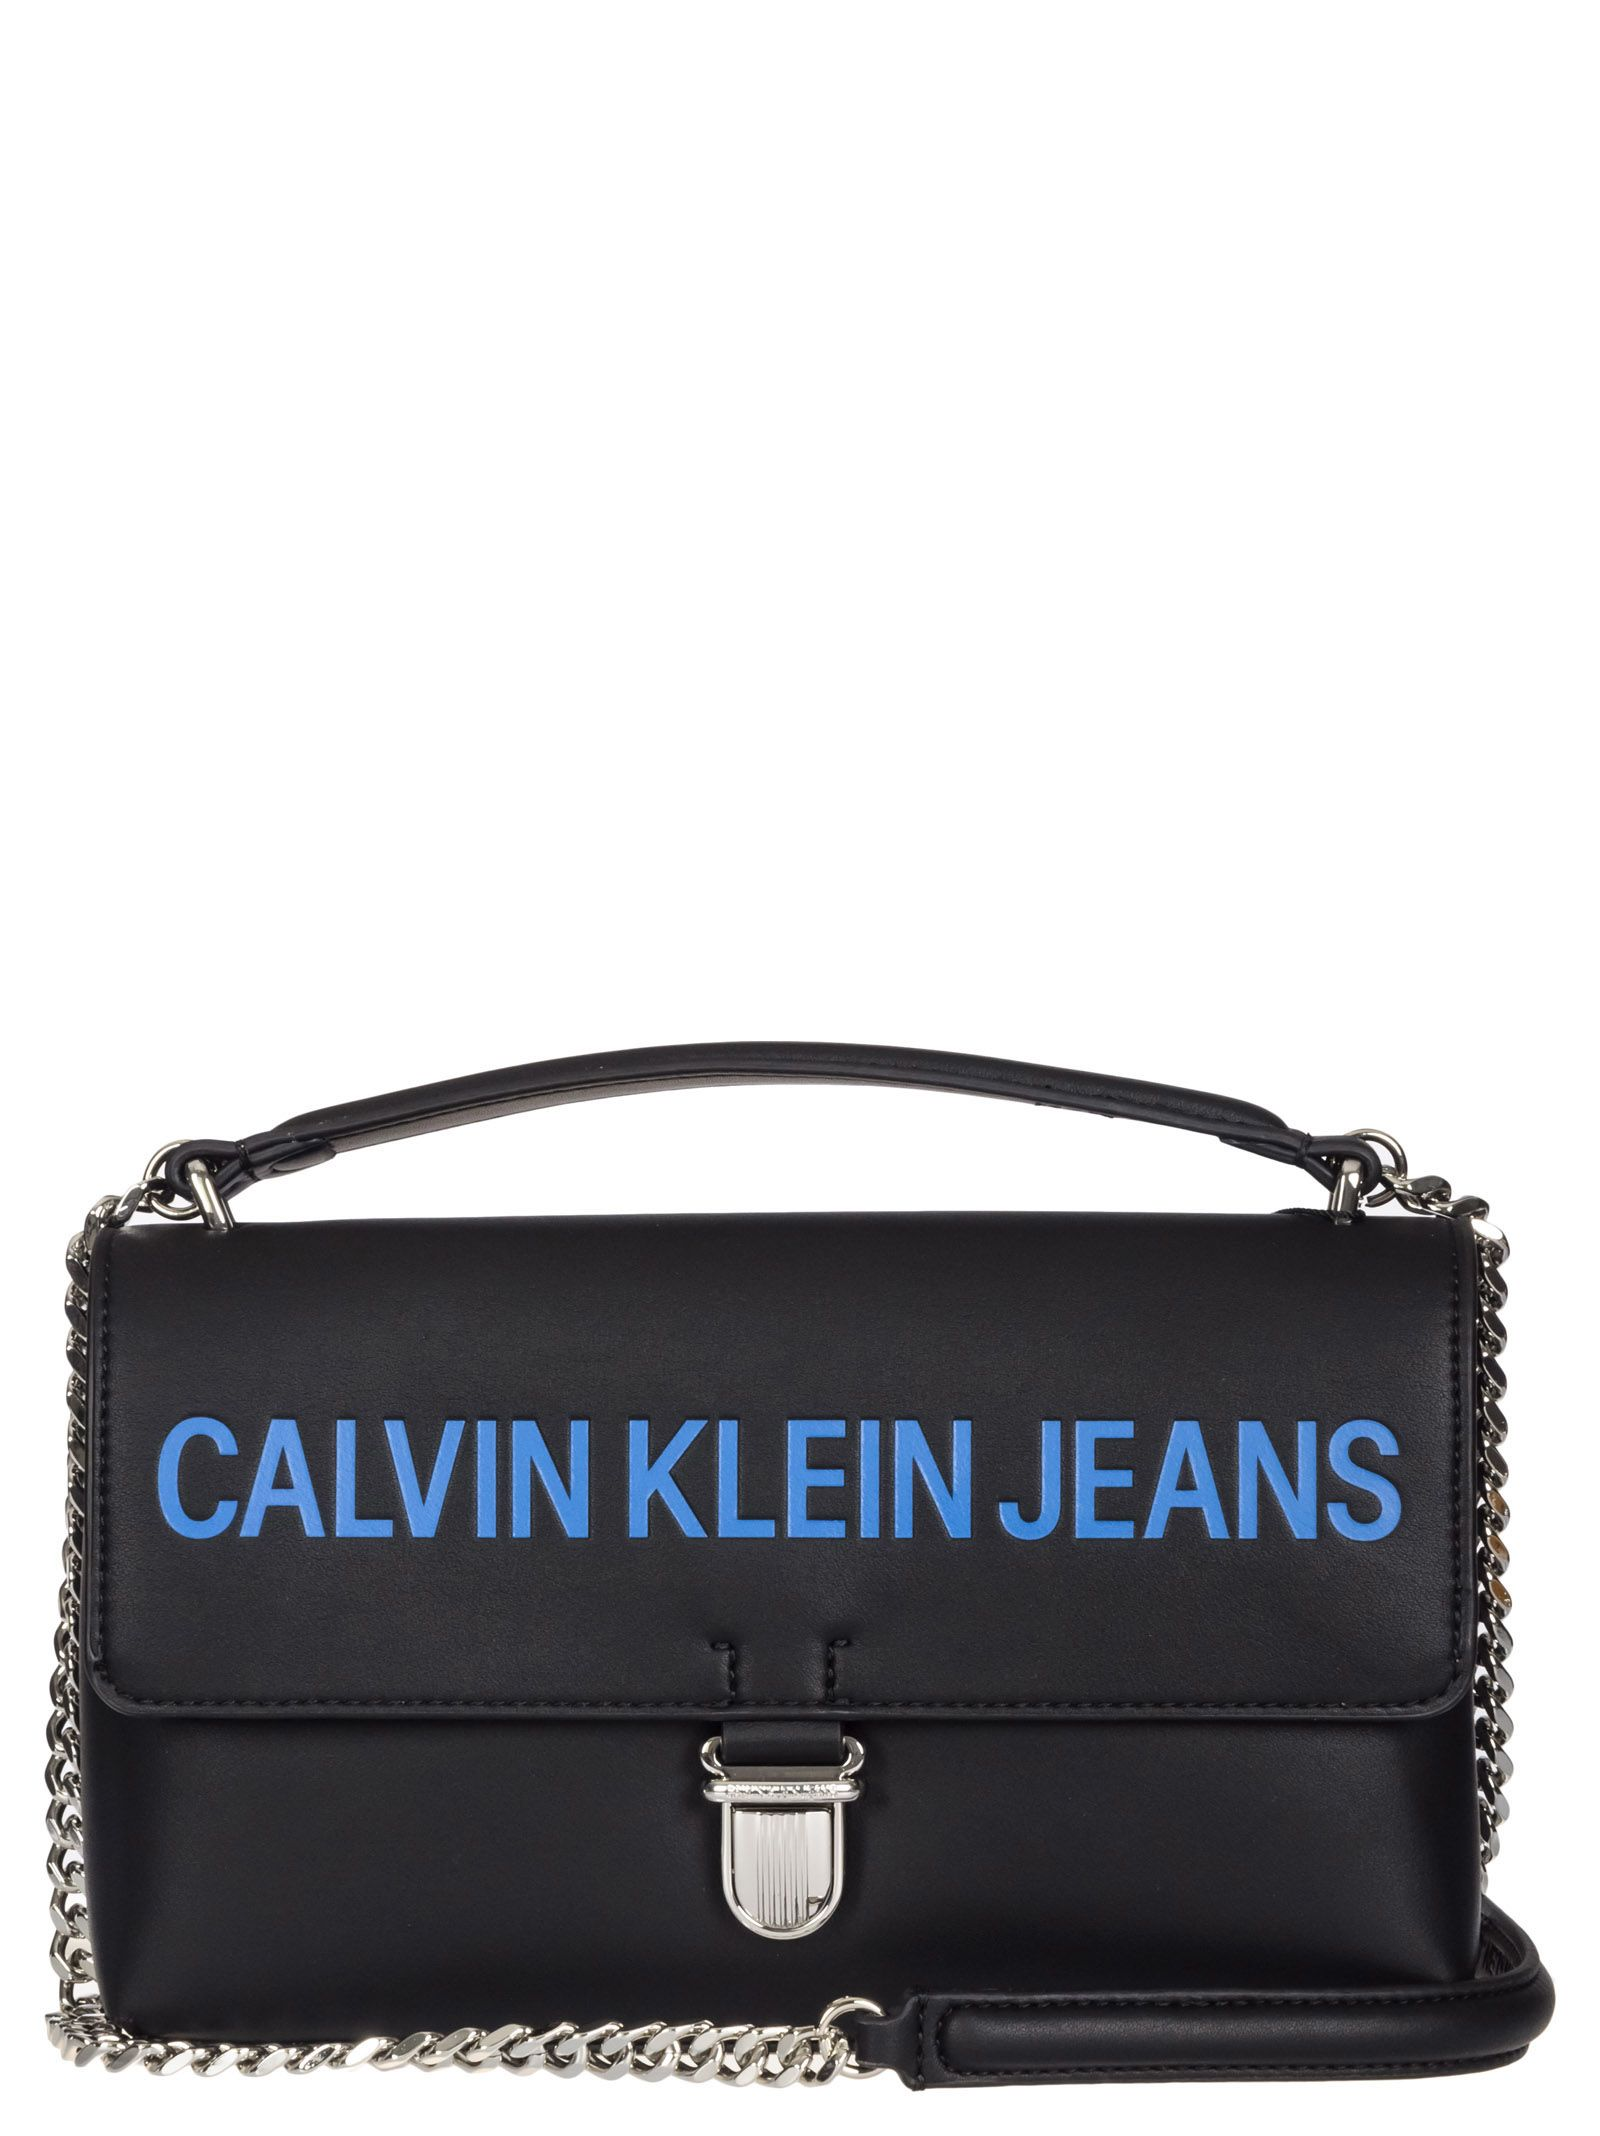 Calvin Klein Jeans Sculpted Crossbody